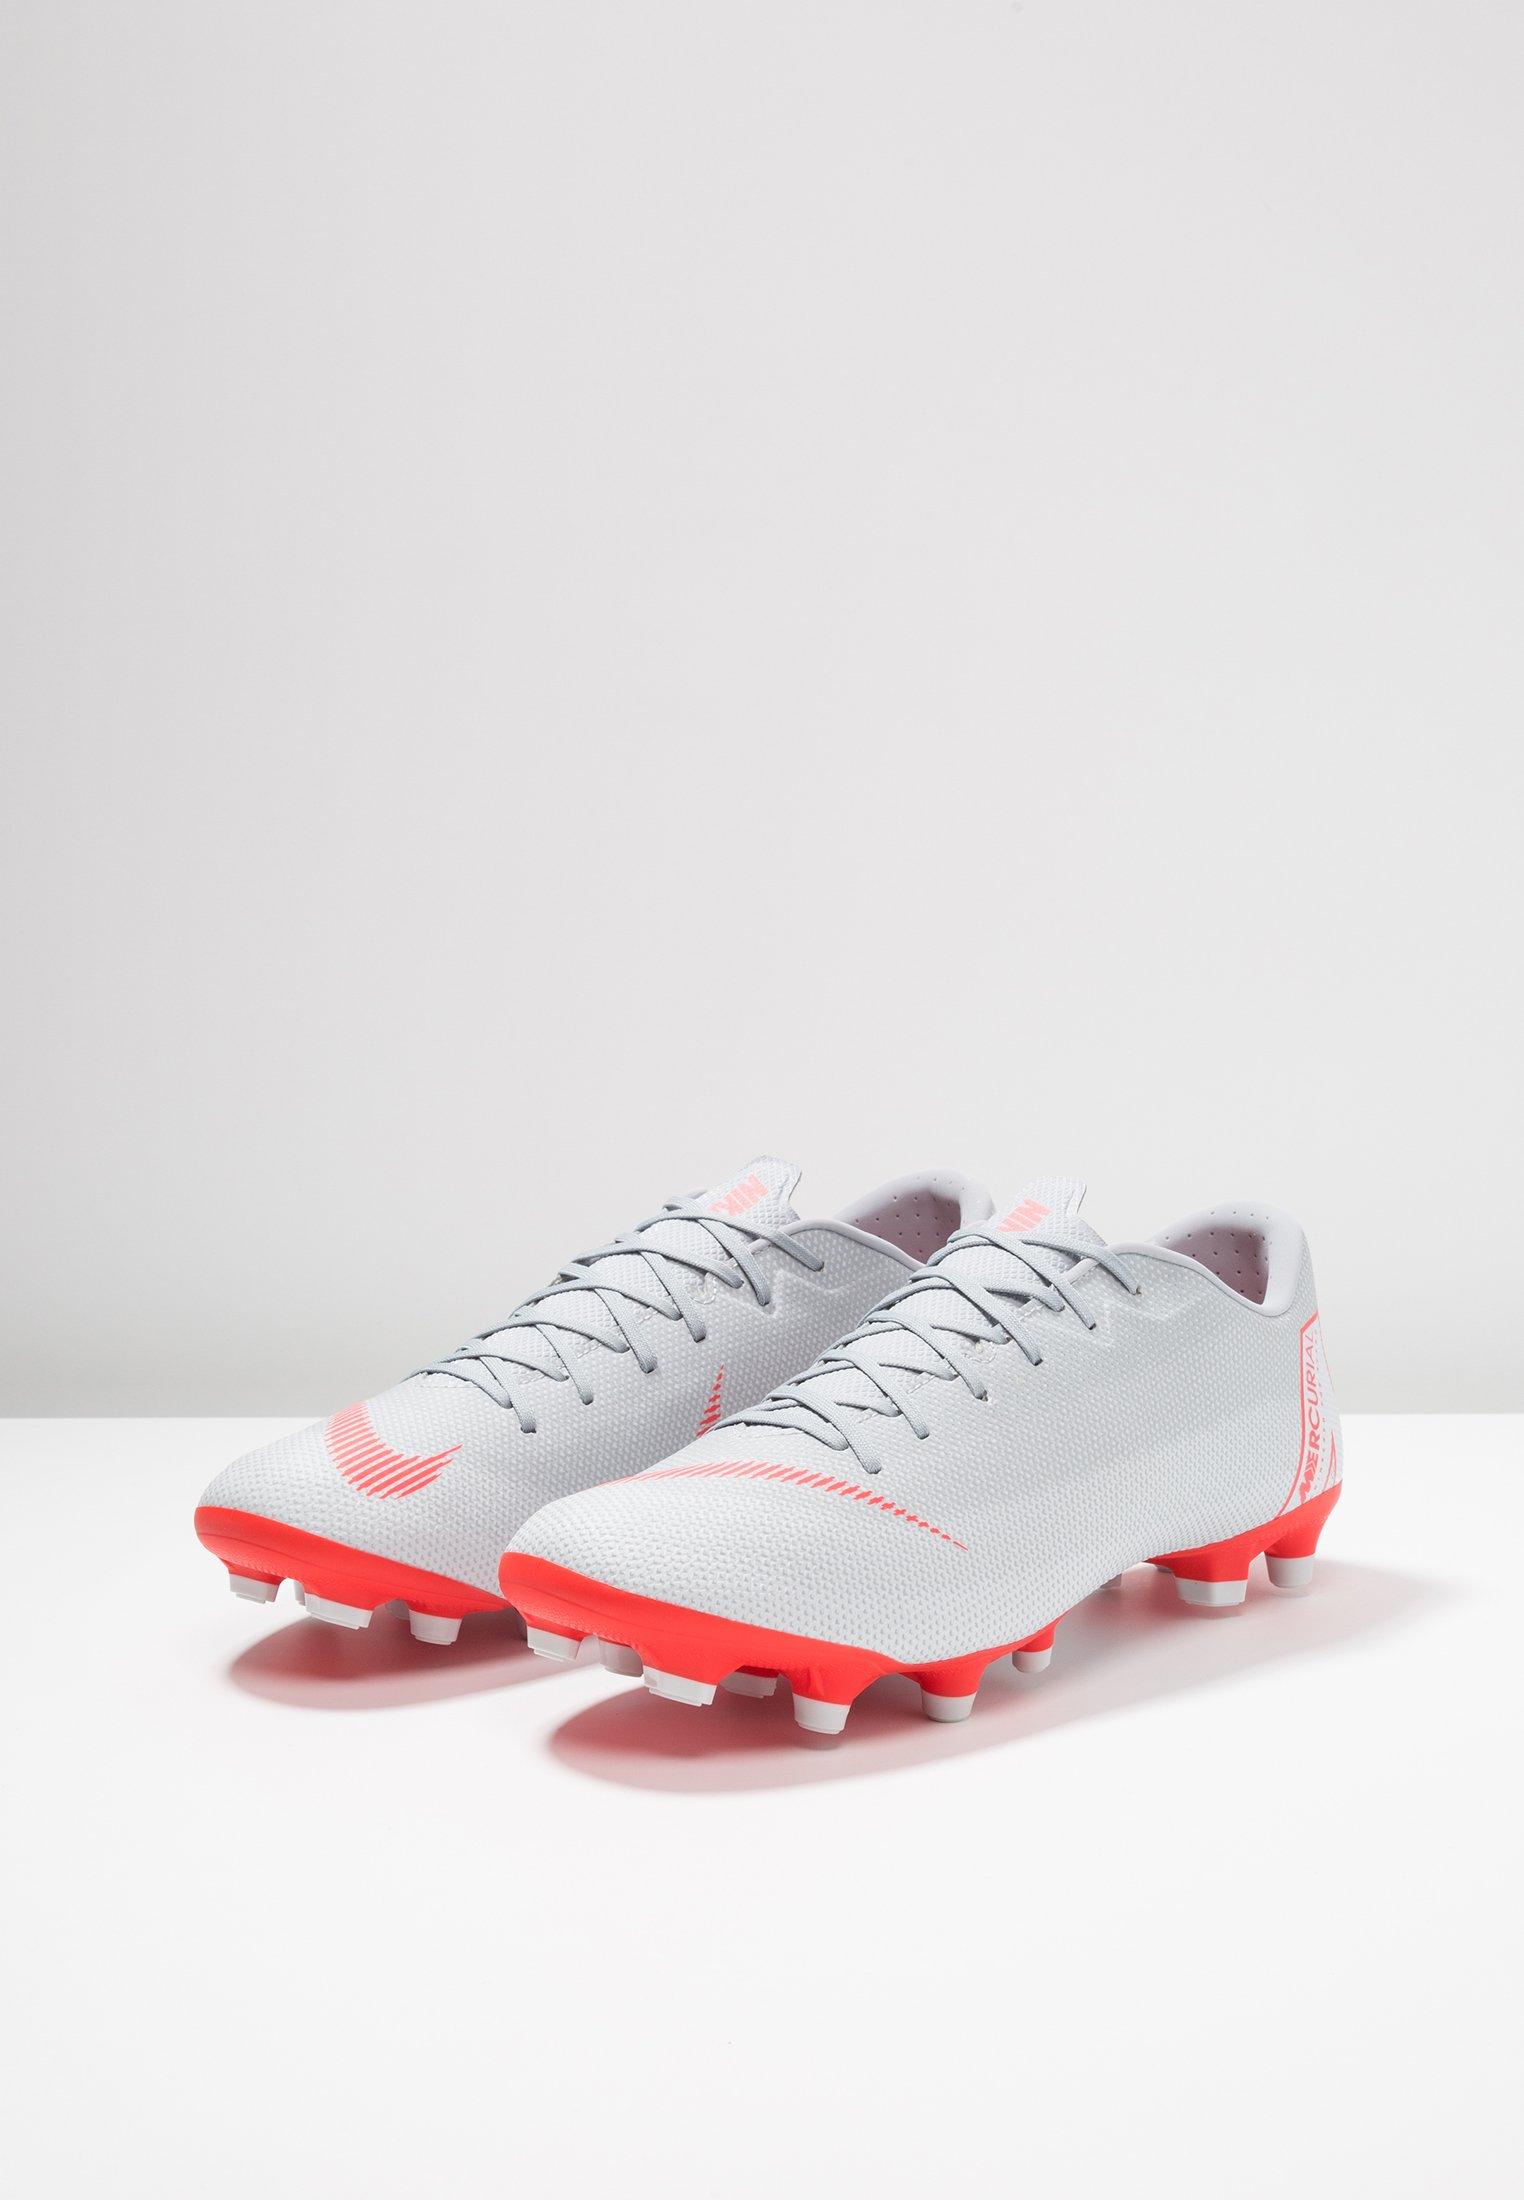 Nike Performance MERCURIAL VAPOR 12 ACADEMY MG - Chaussures de foot à crampons wolf grey/bright crimson/pure platinum/metallic silver